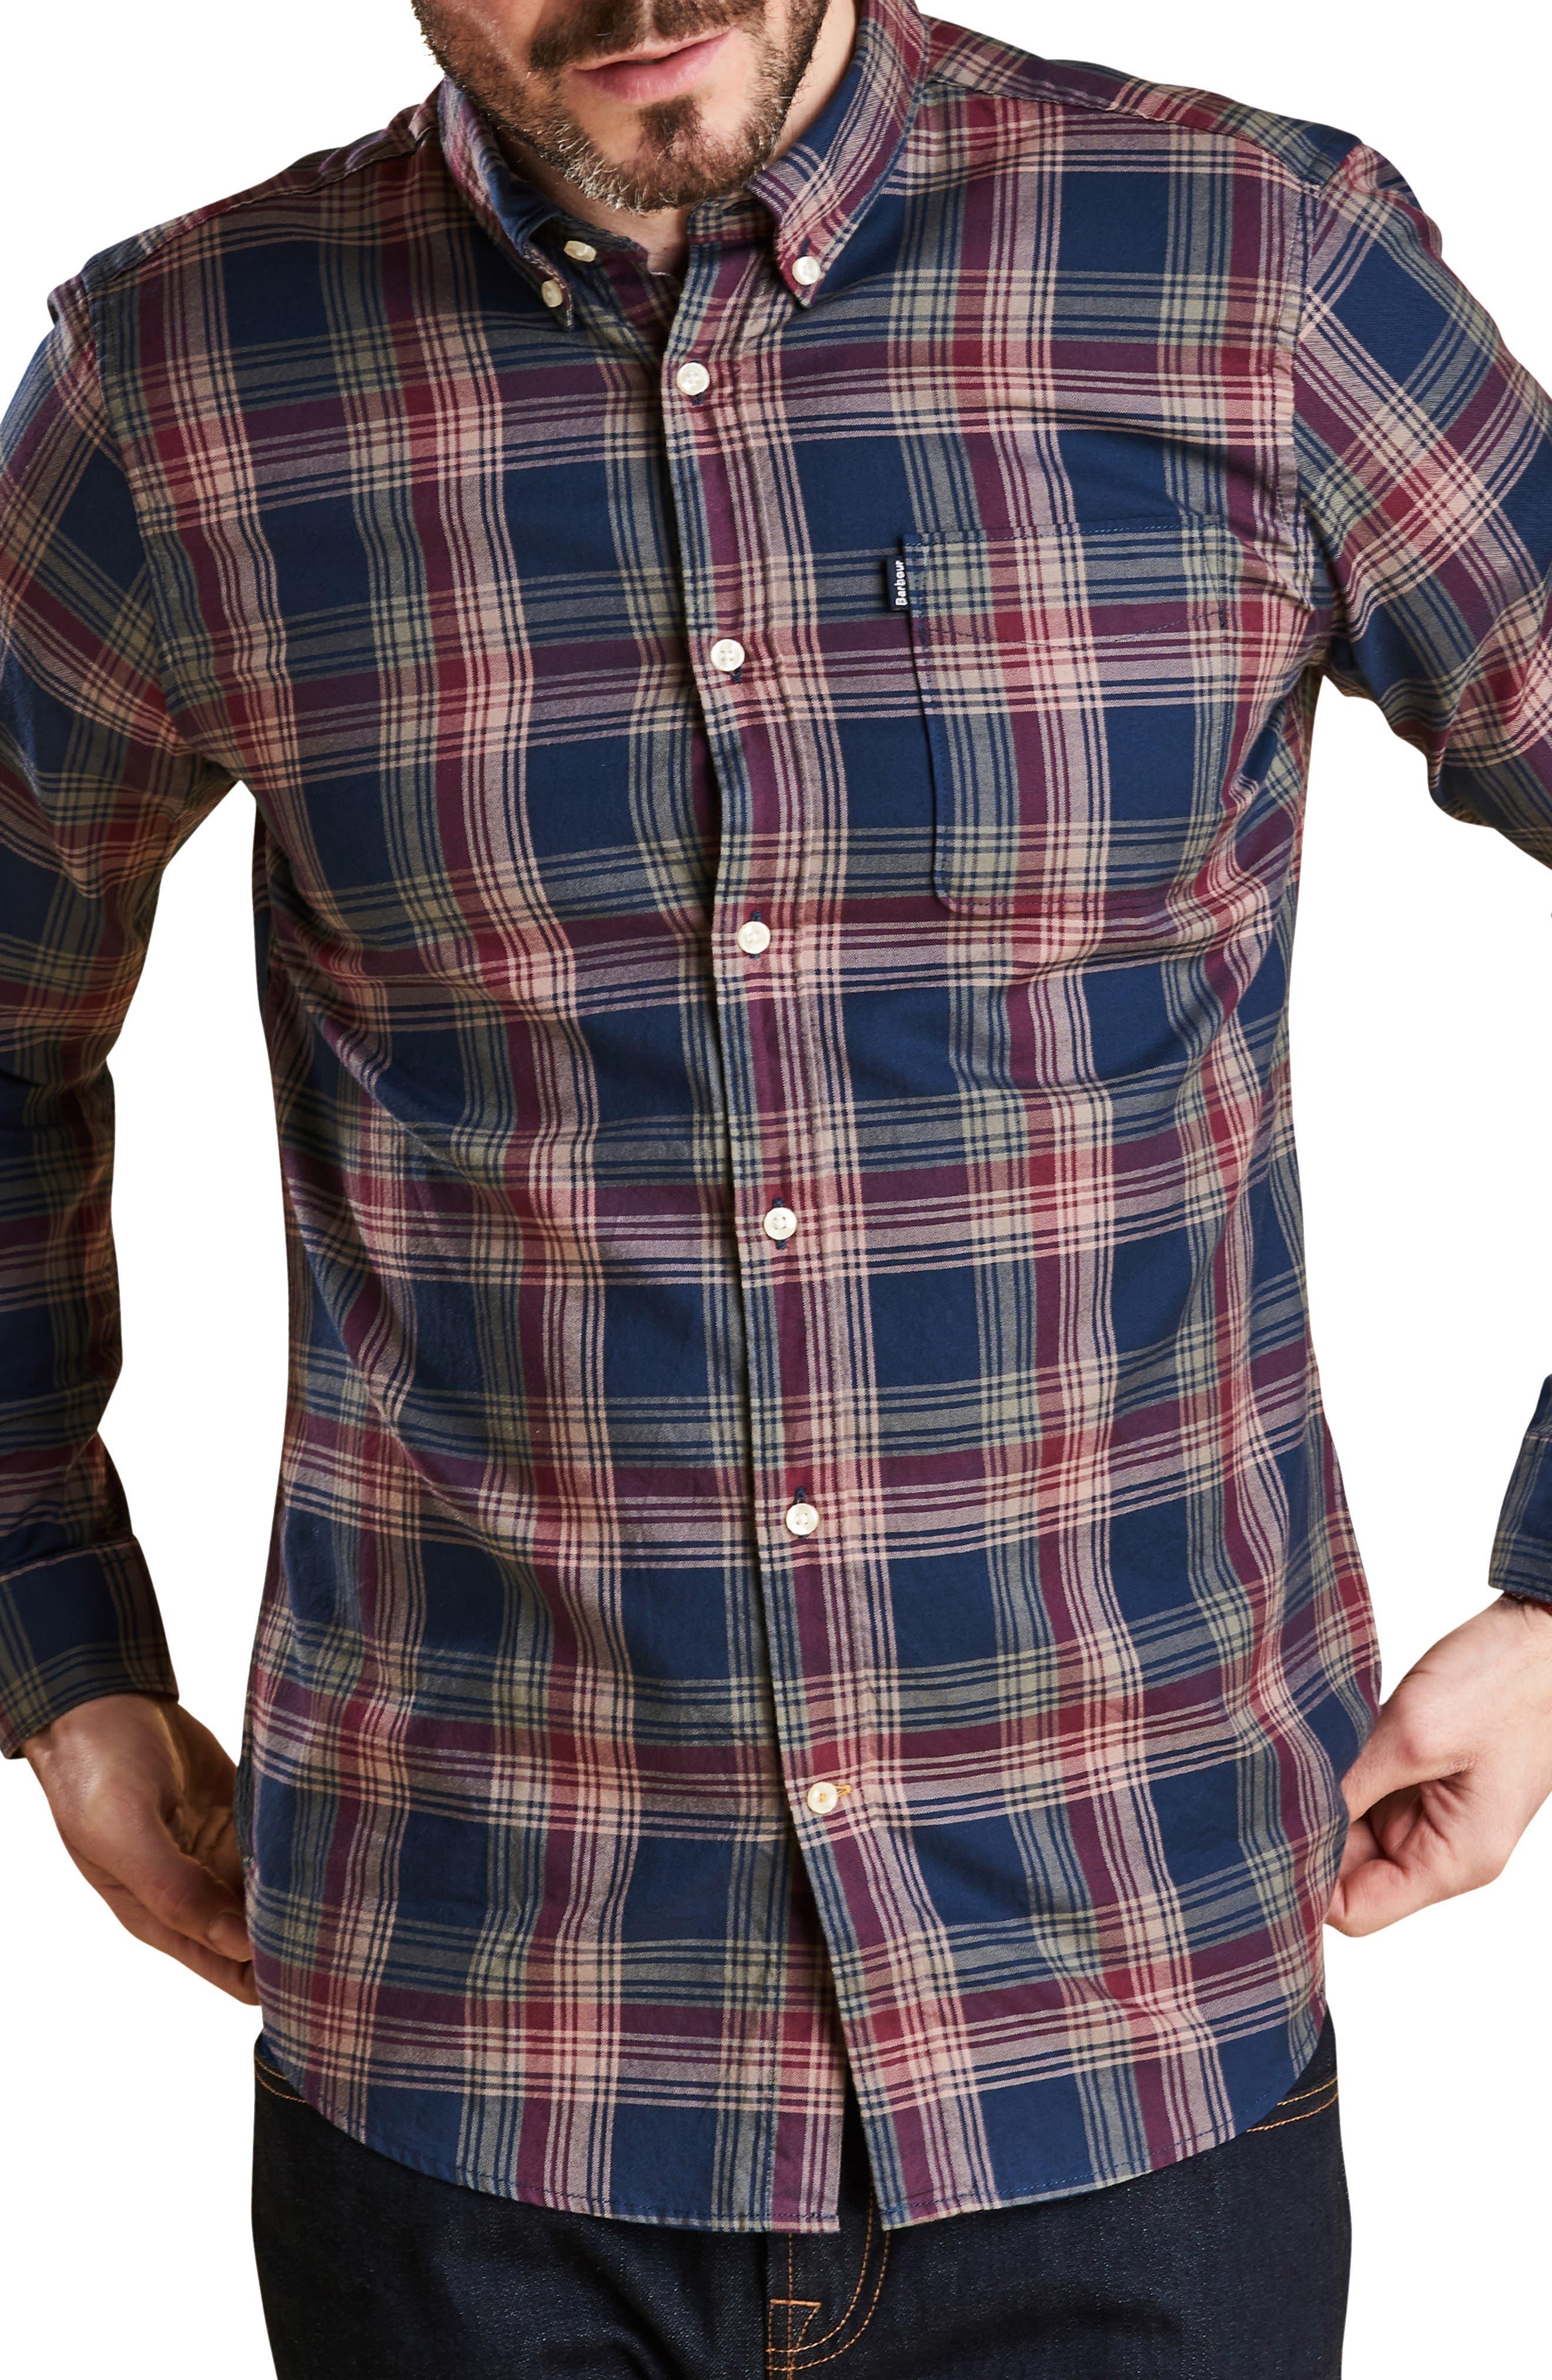 Endsleigh Highland Check Woven Shirt,                             Main thumbnail 1, color,                             NAVY